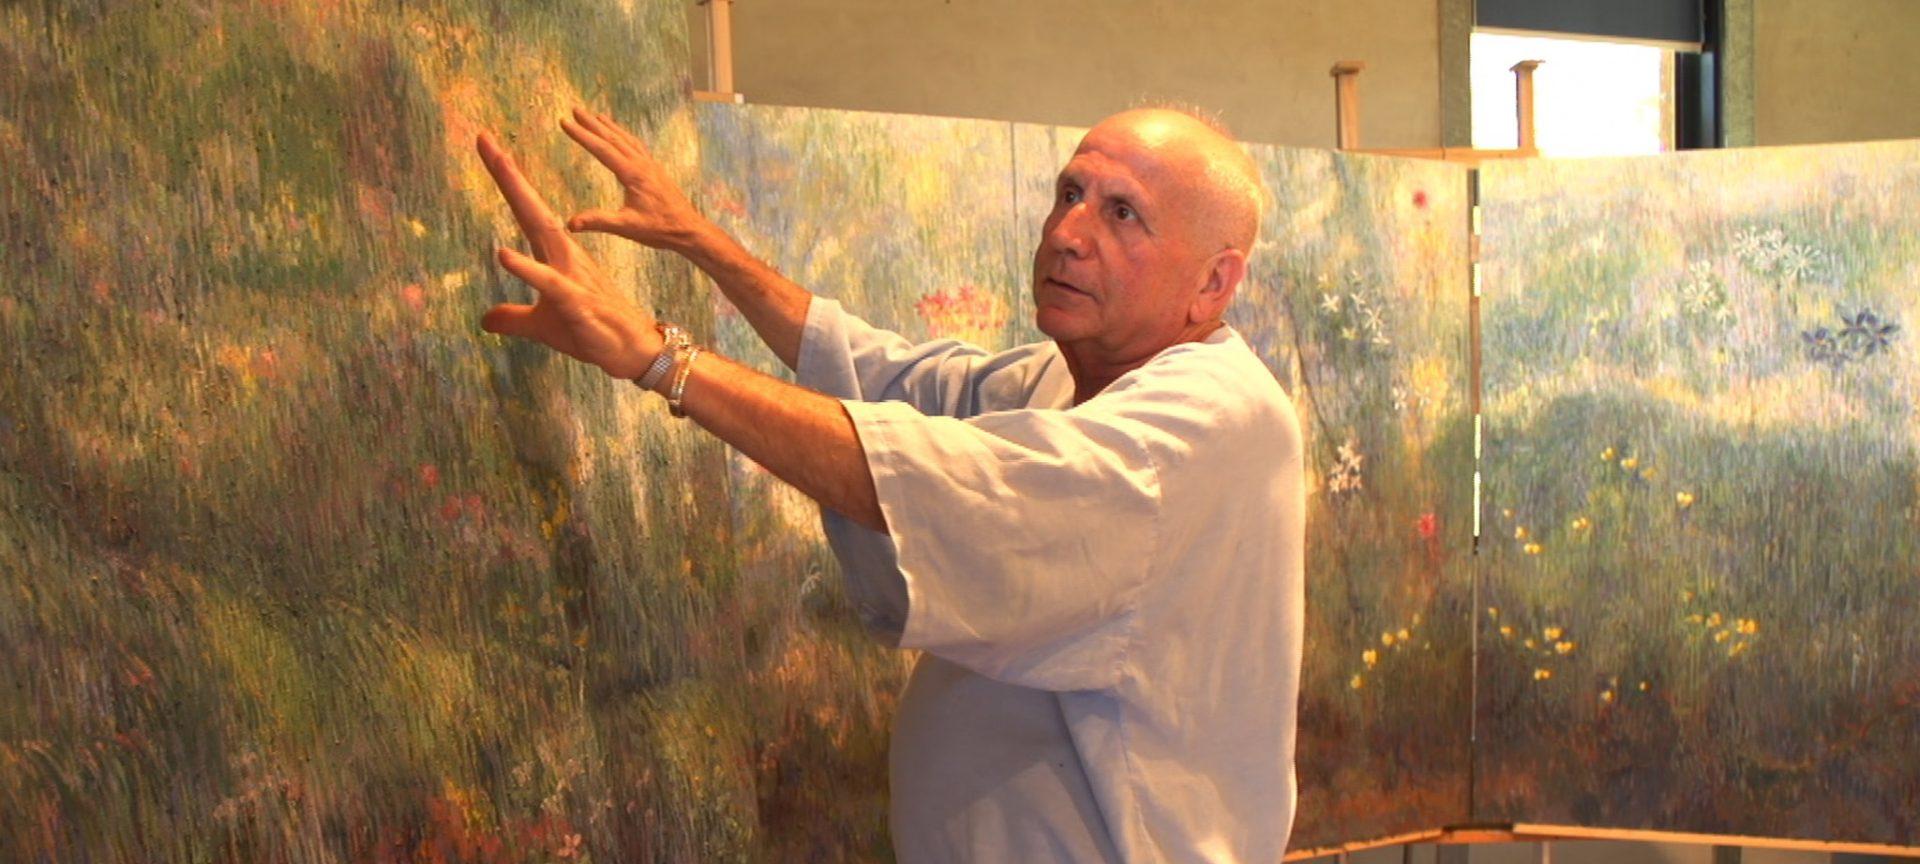 SALVATORE ZOFREA - Master of Light - Australian Cultural Fund